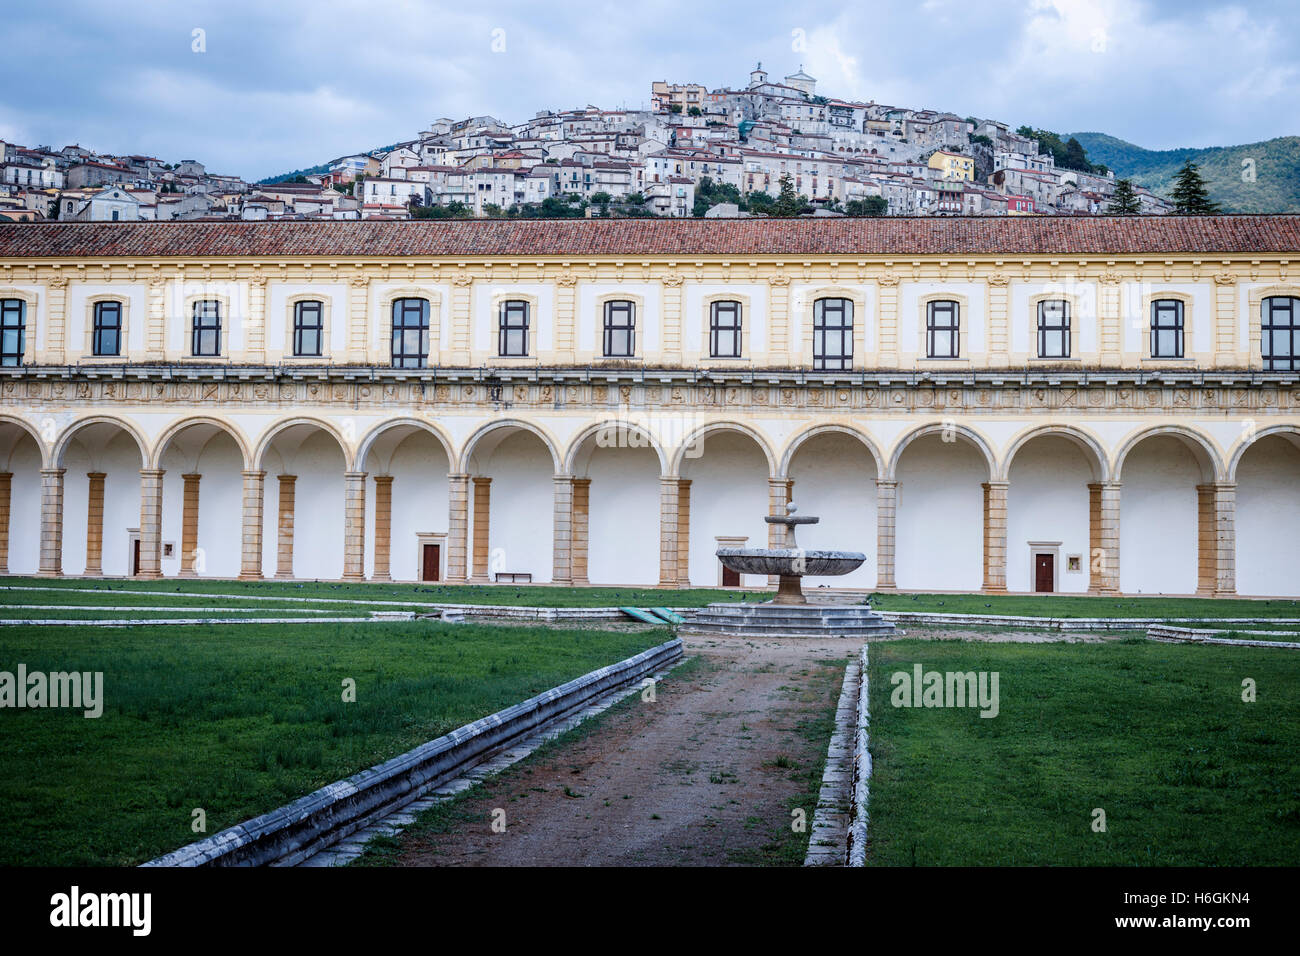 Great Cloister of the Certosa di San Lorenzo Charterhouse in Padula, Campania, Italy. Stock Photo